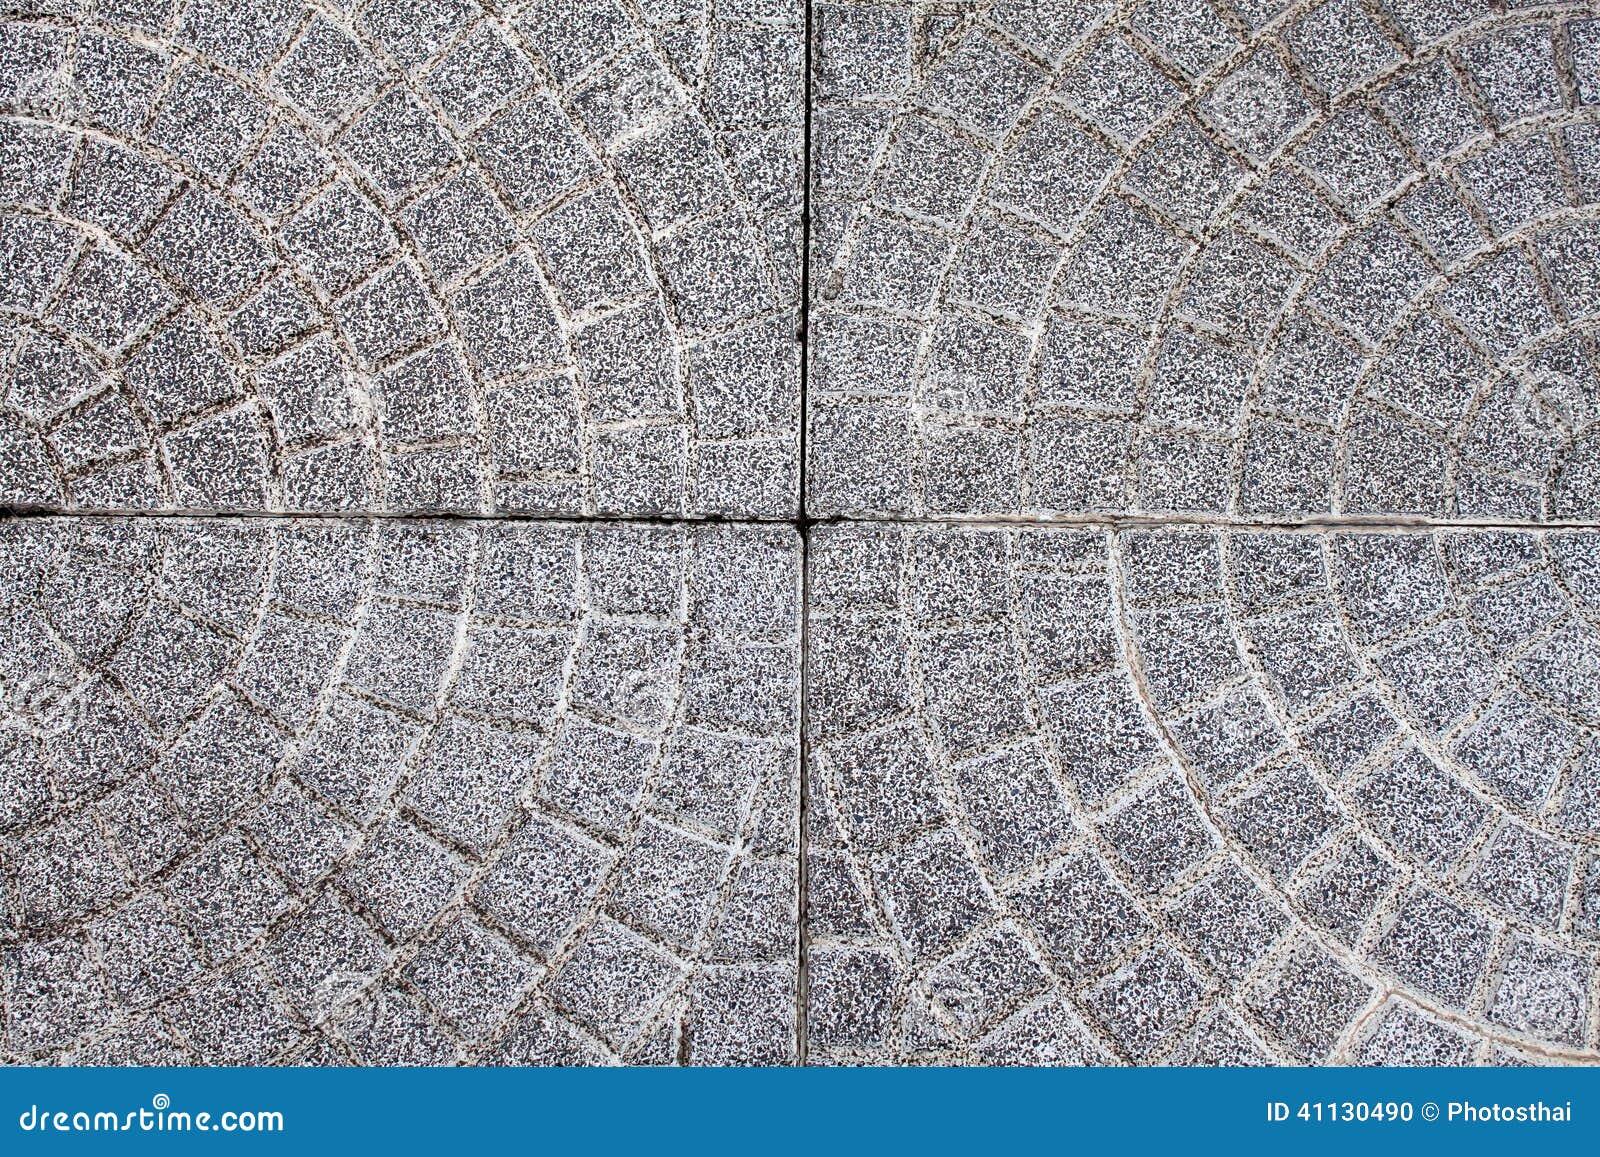 Concrete Floor Tiles Stock Photo Image Of Backdrop